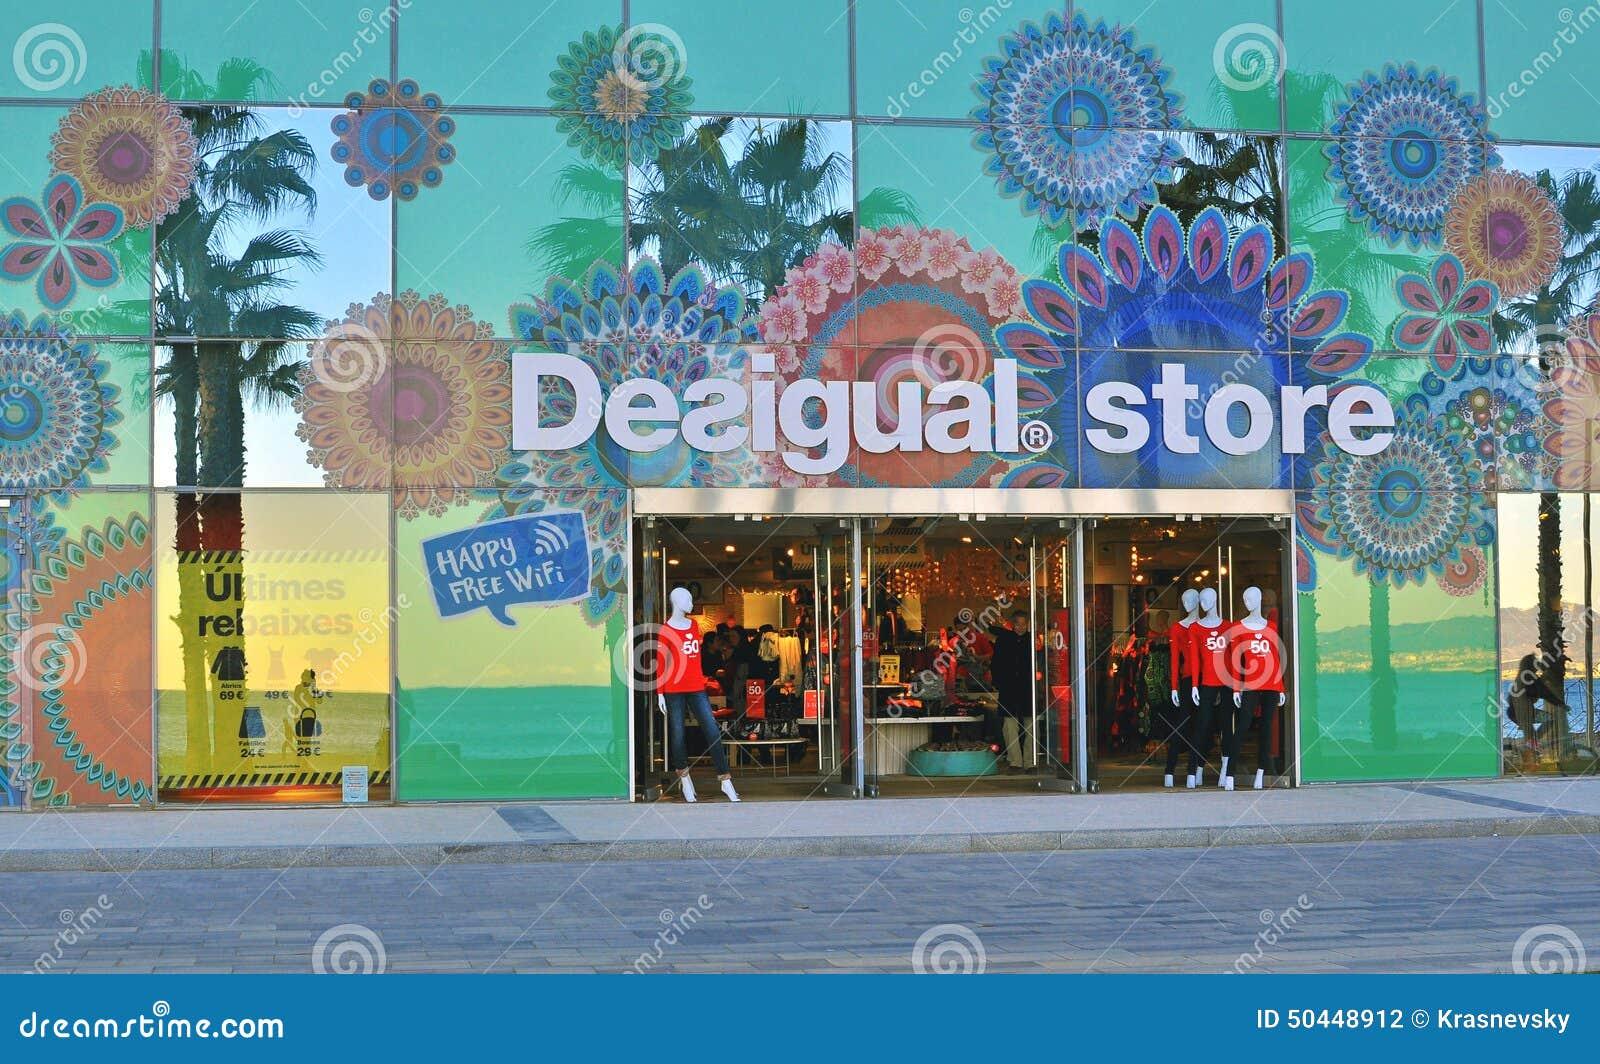 Barcelona Based Fashion Brand